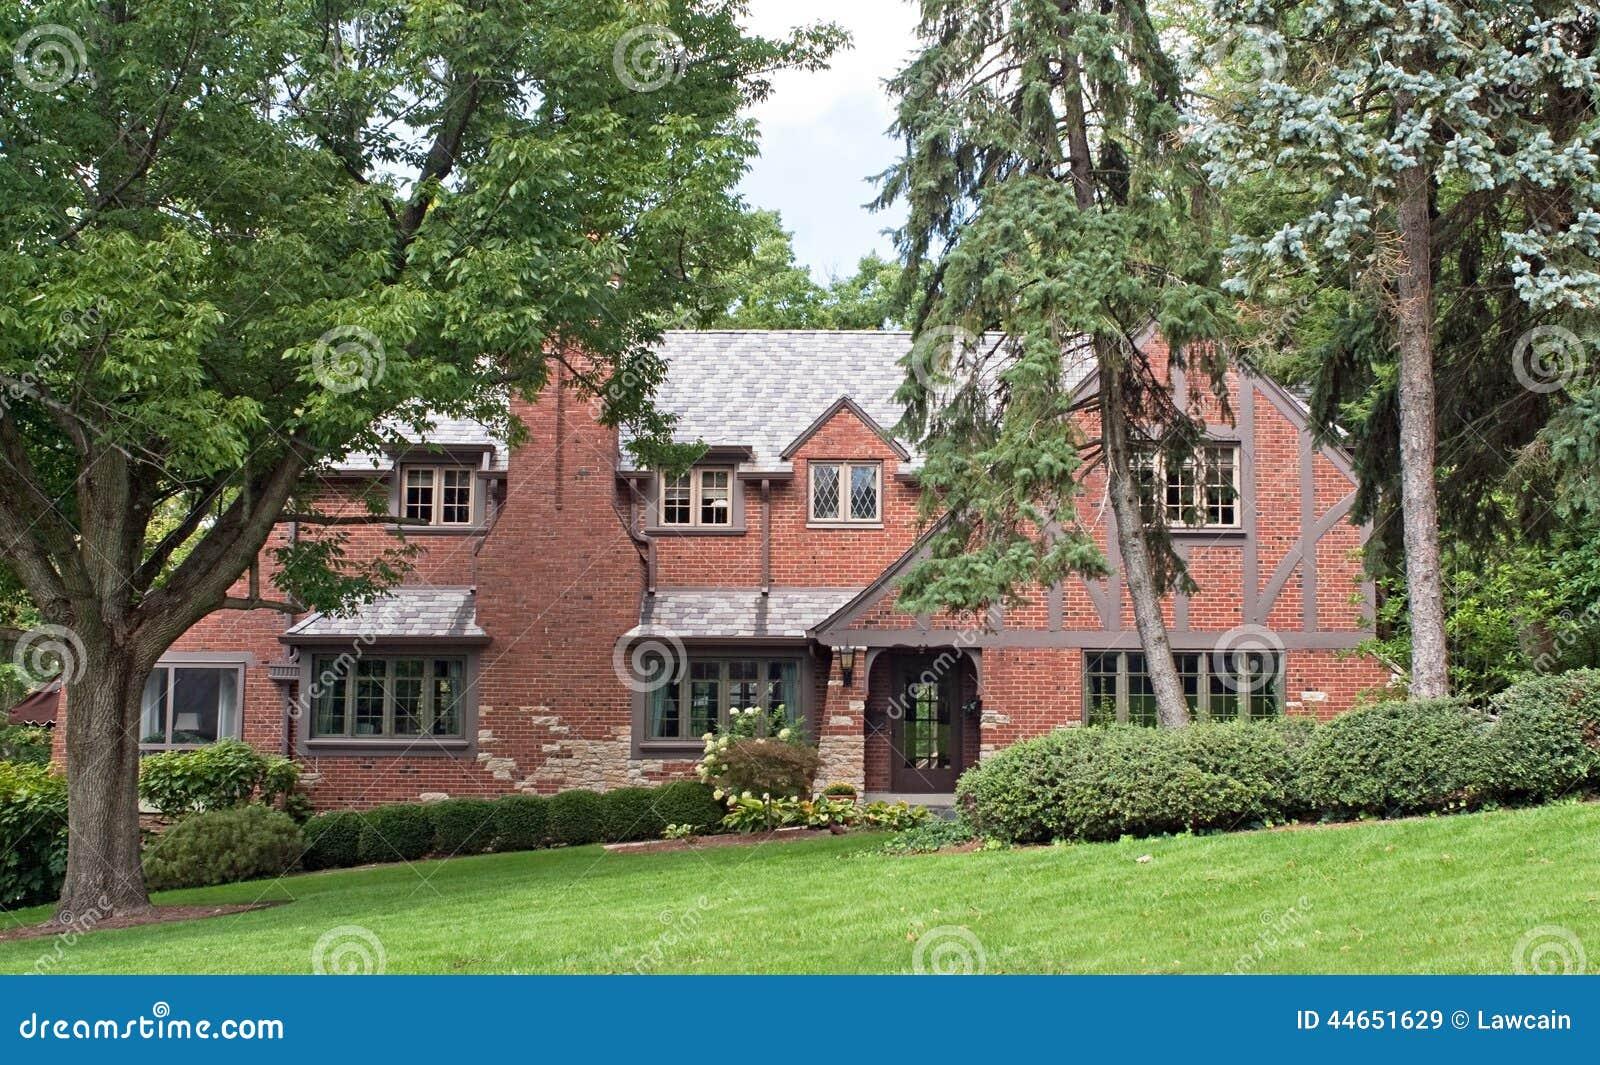 Brick english tutor home stock photo image 44651629 for Tutor house